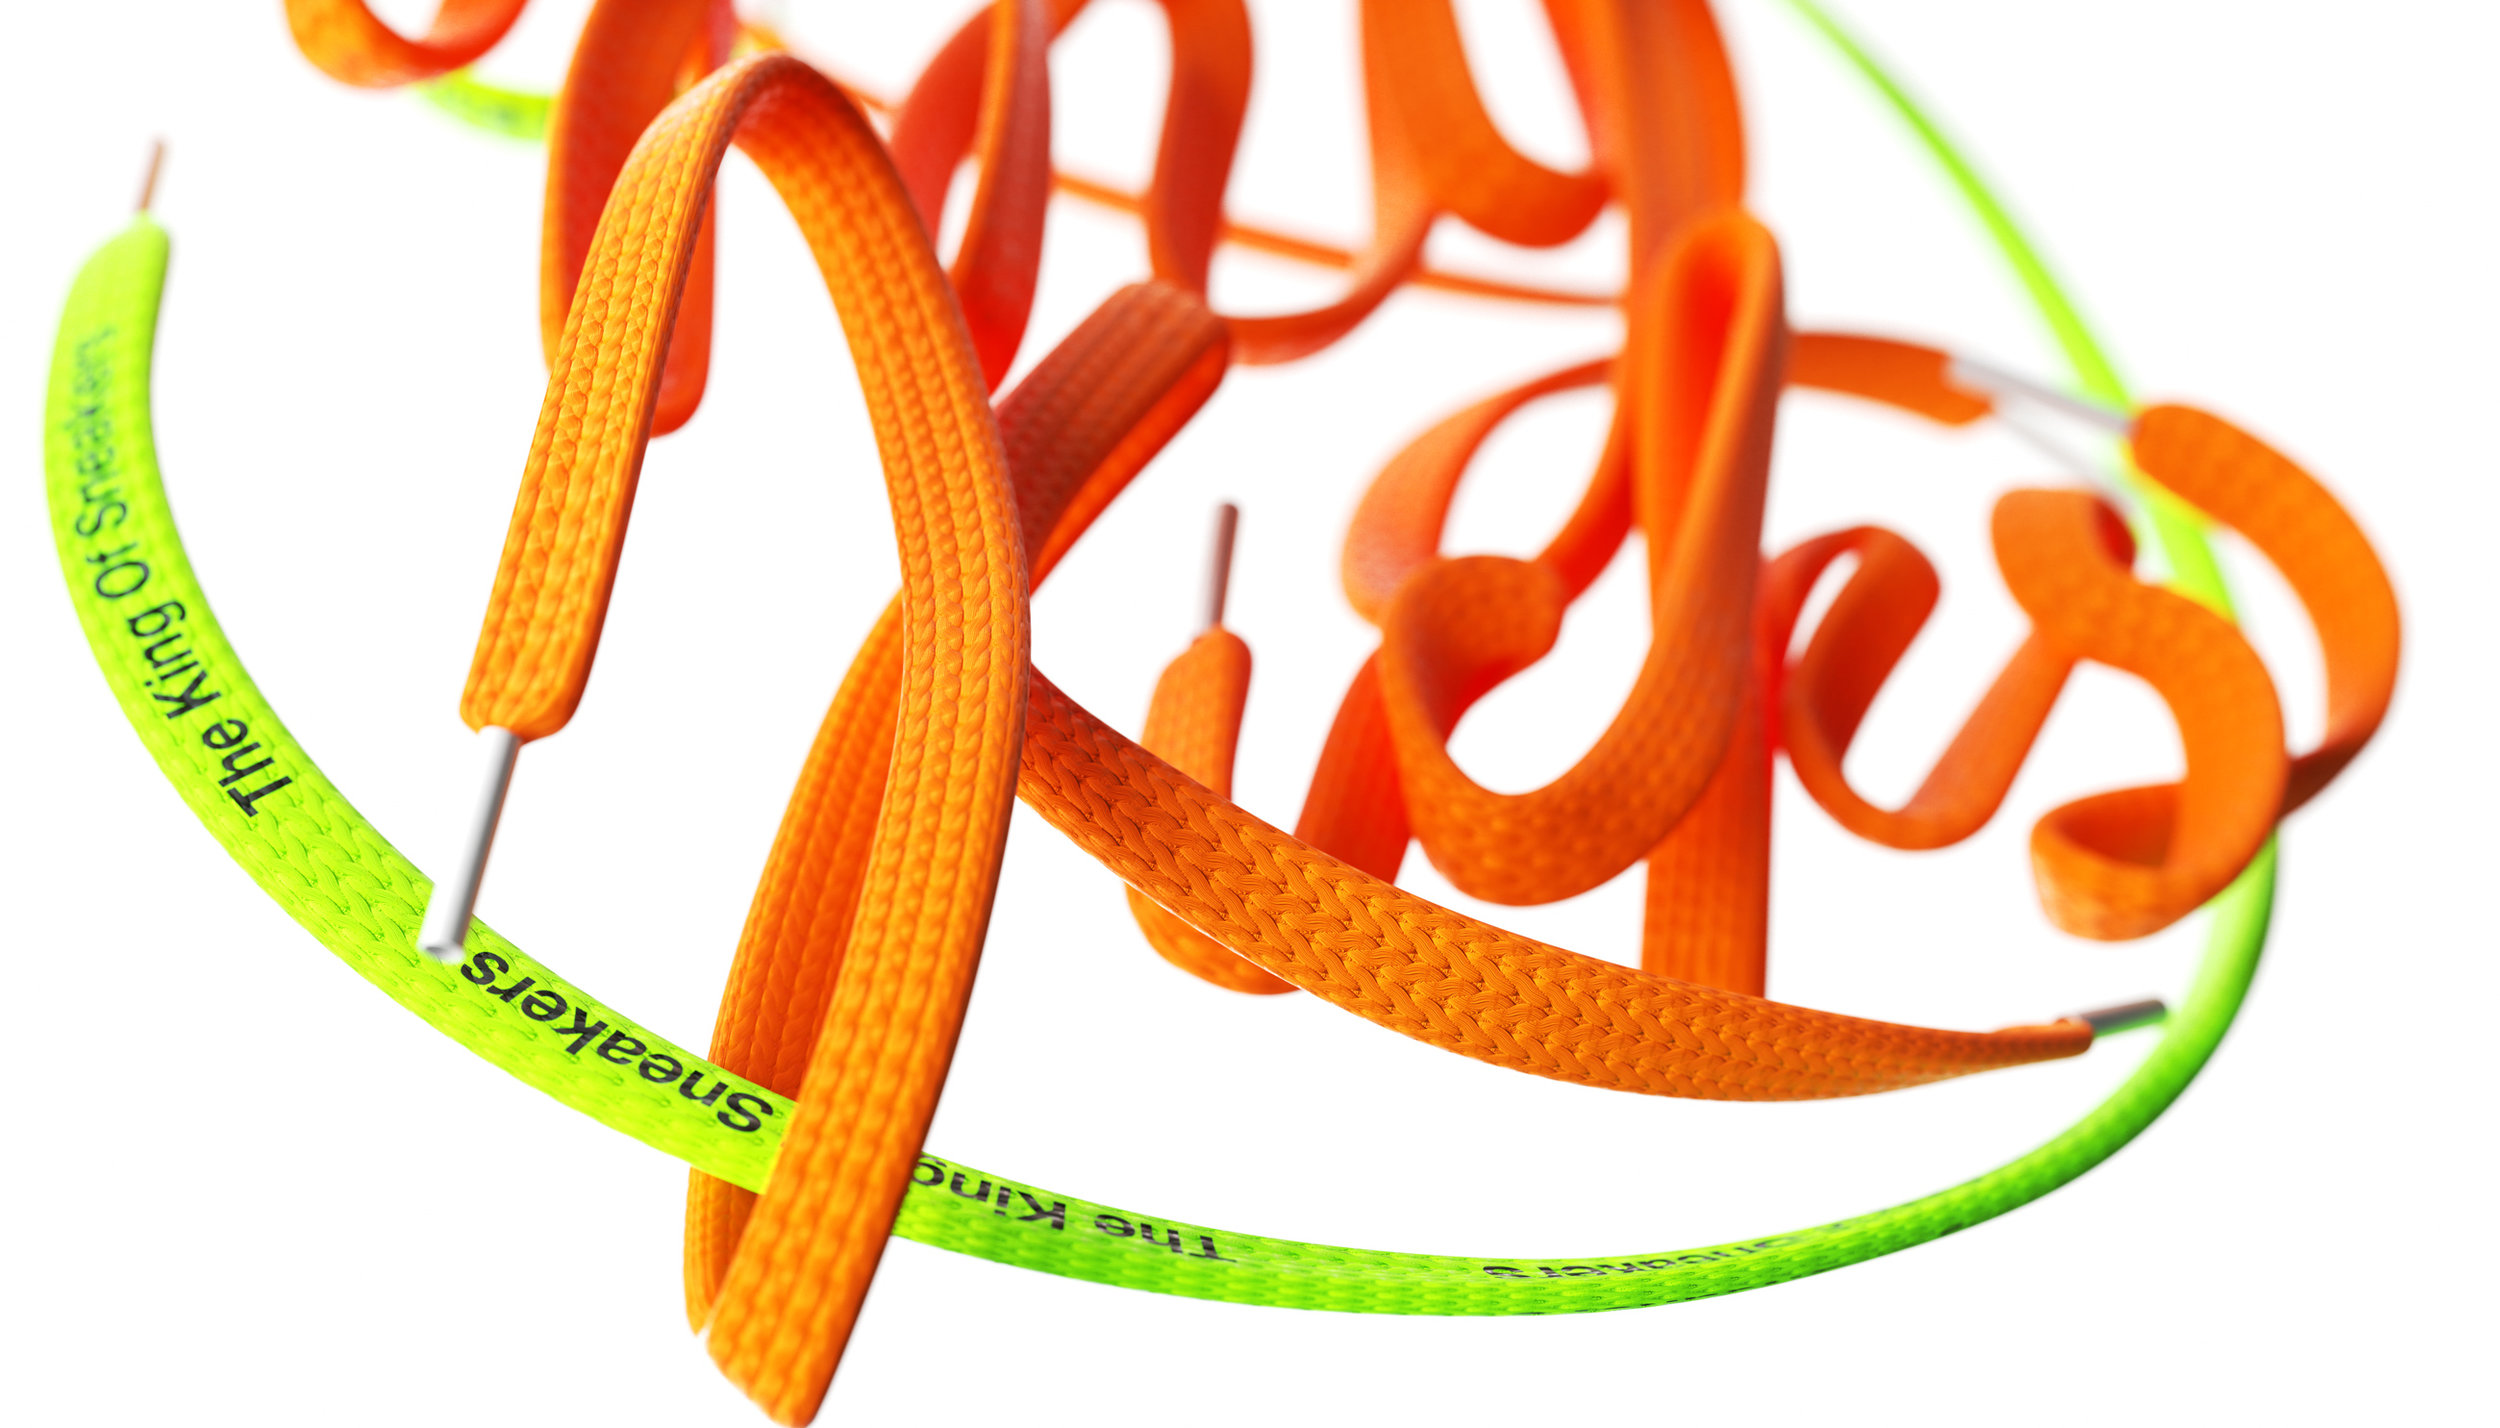 KissMyKicks-3DTypography_ShoeLace_OrangeGreen_BenFearnley-DOF_Landscape-2.jpg